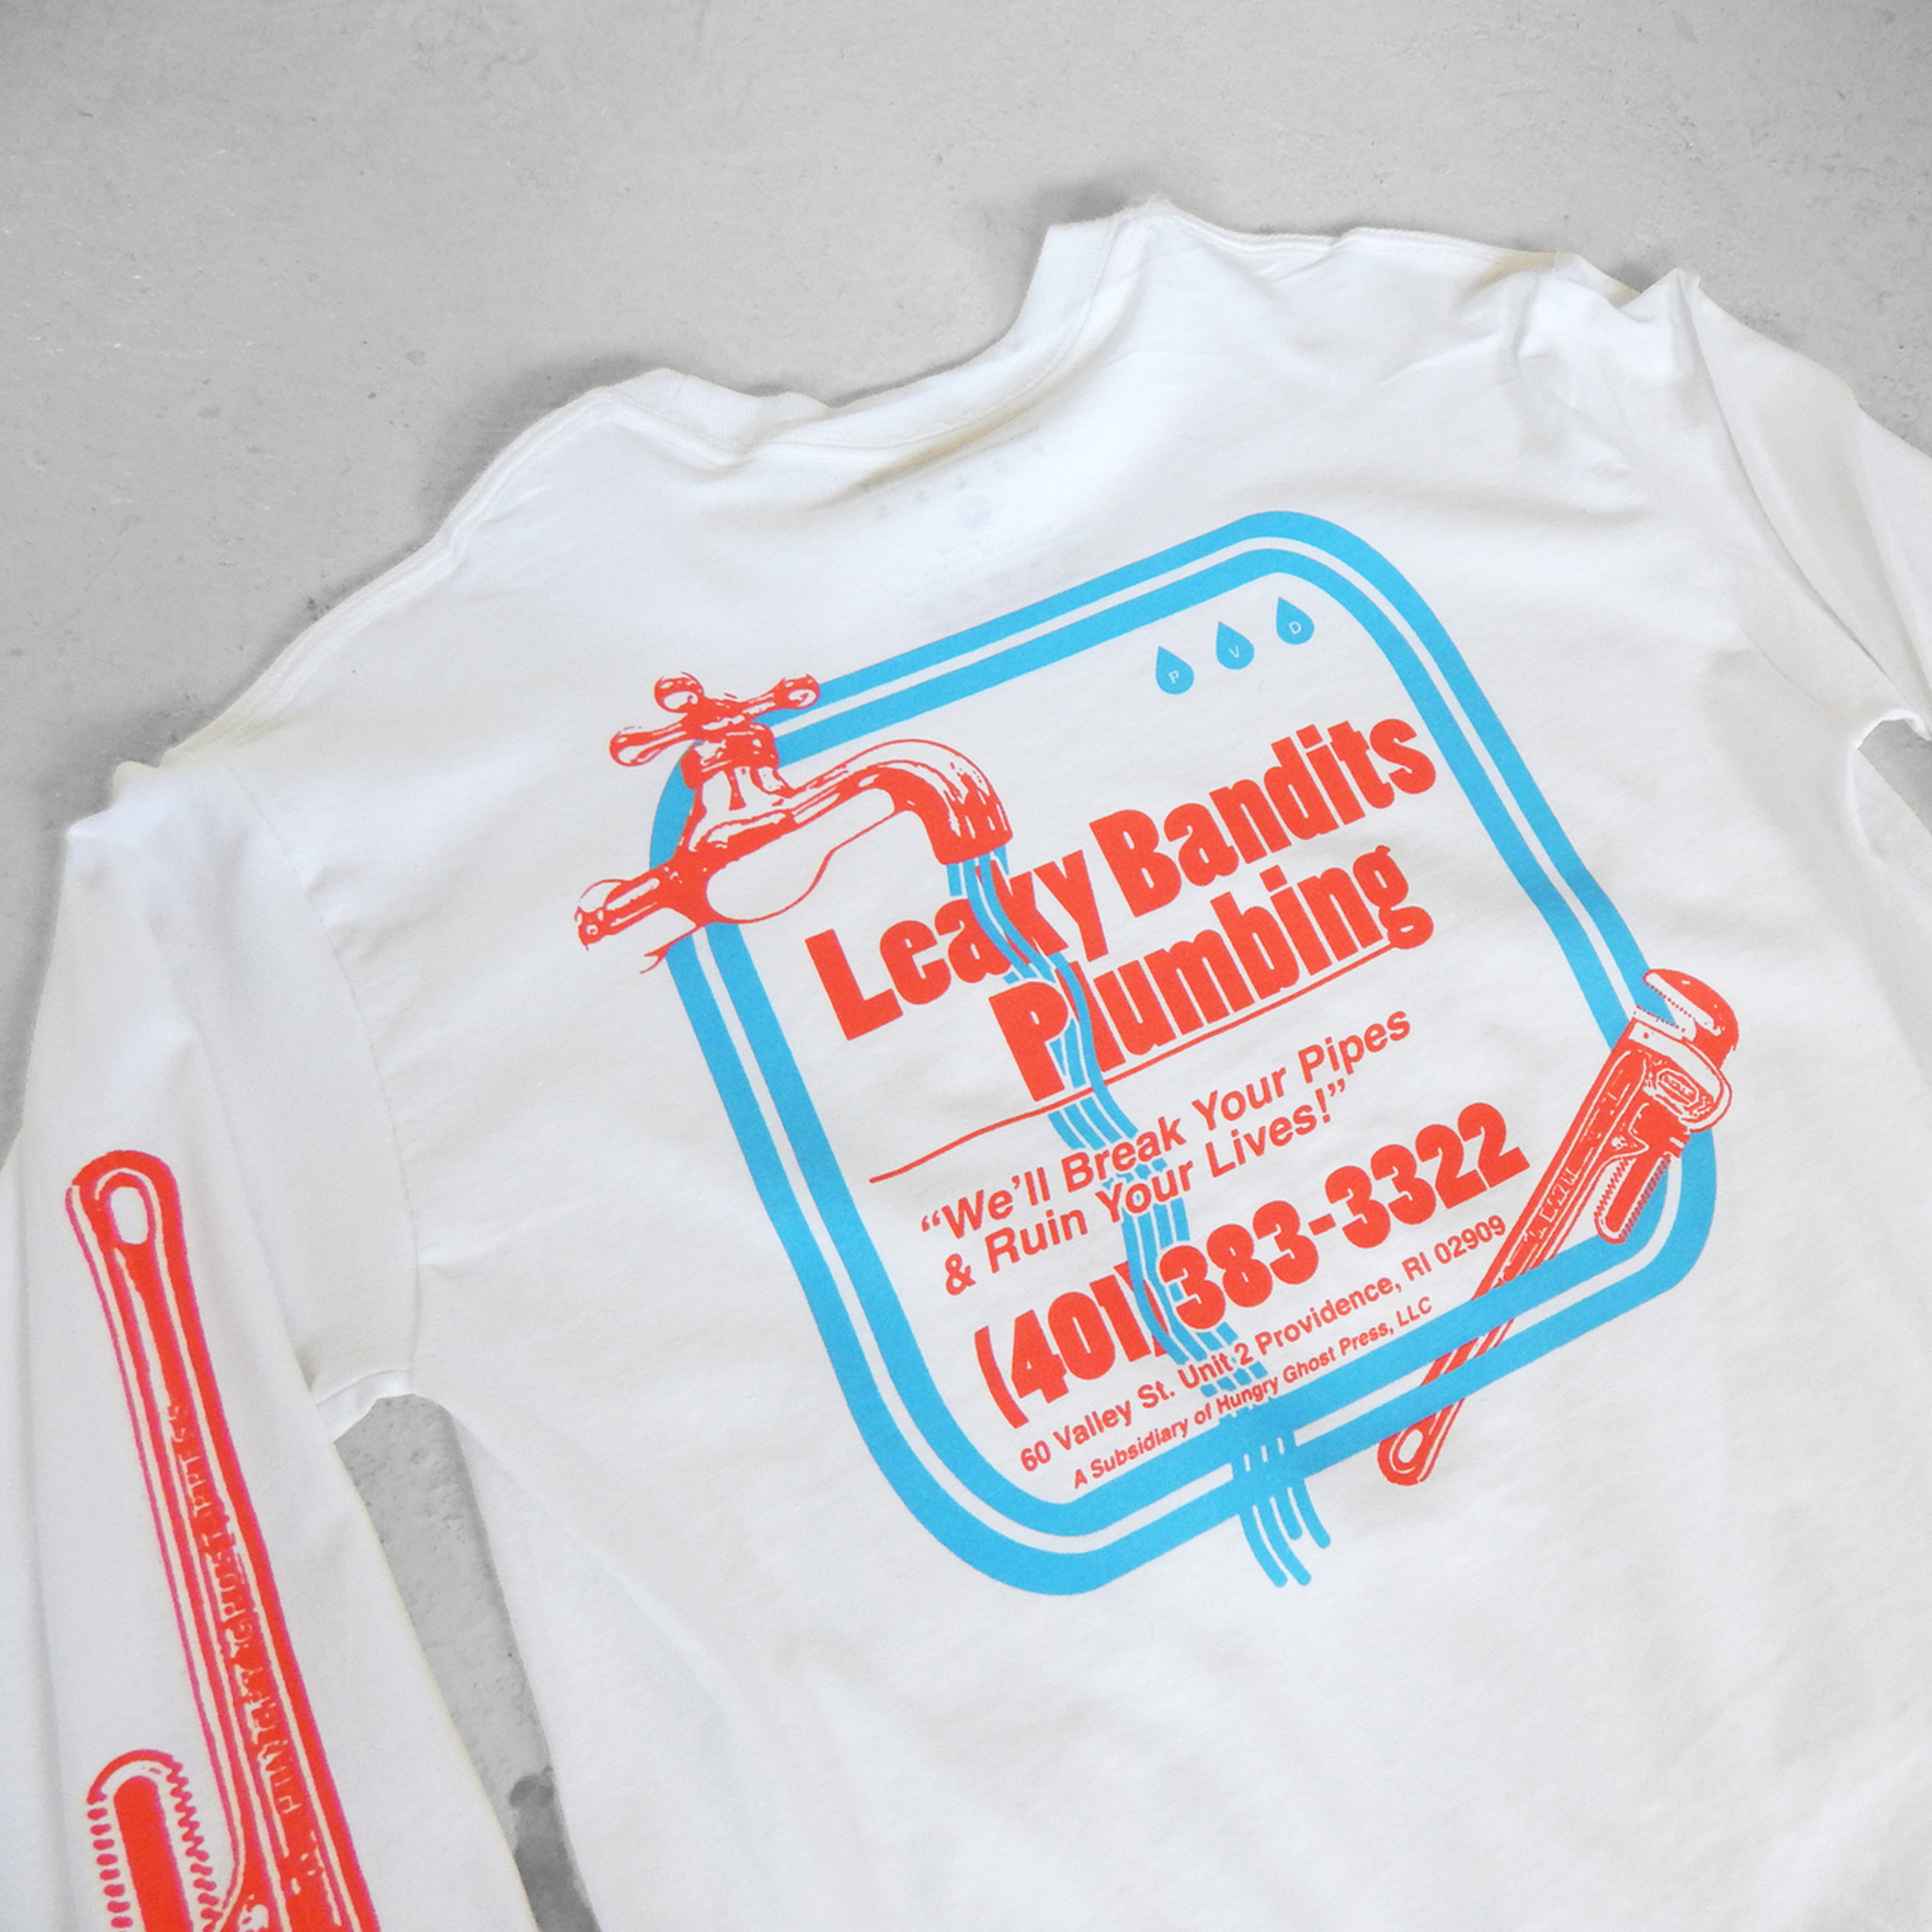 Leaky Bandits White Long Sleeve